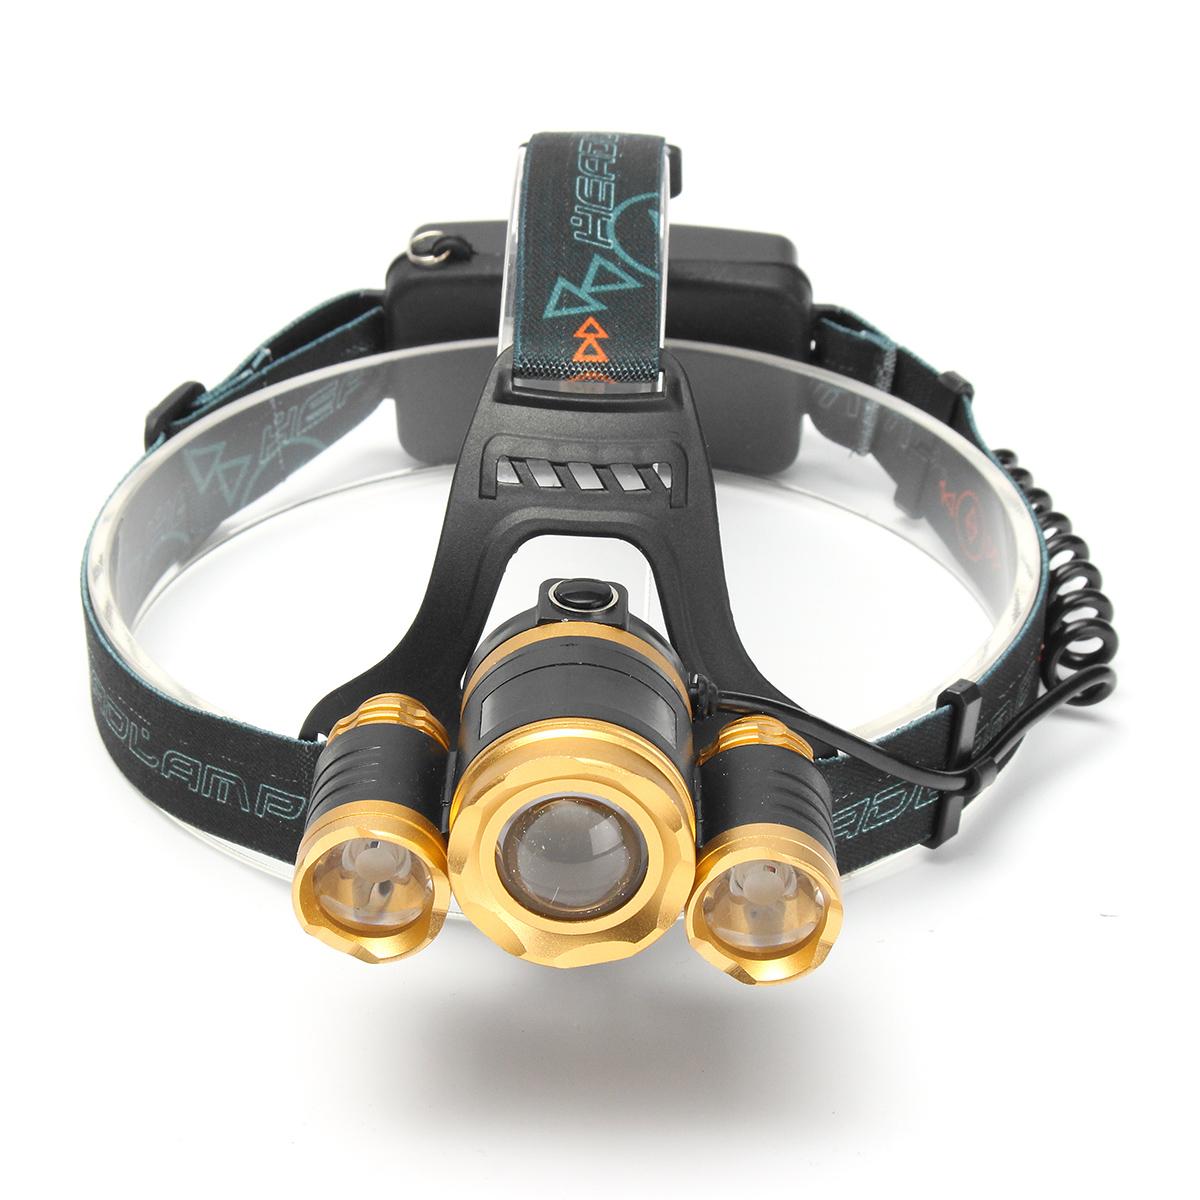 Elfeland 6000Lumens 3xT6 LED Zoomable Headlamp Headlight Flashlight Torch Waterproof 3 Modes (Just Headlamp)